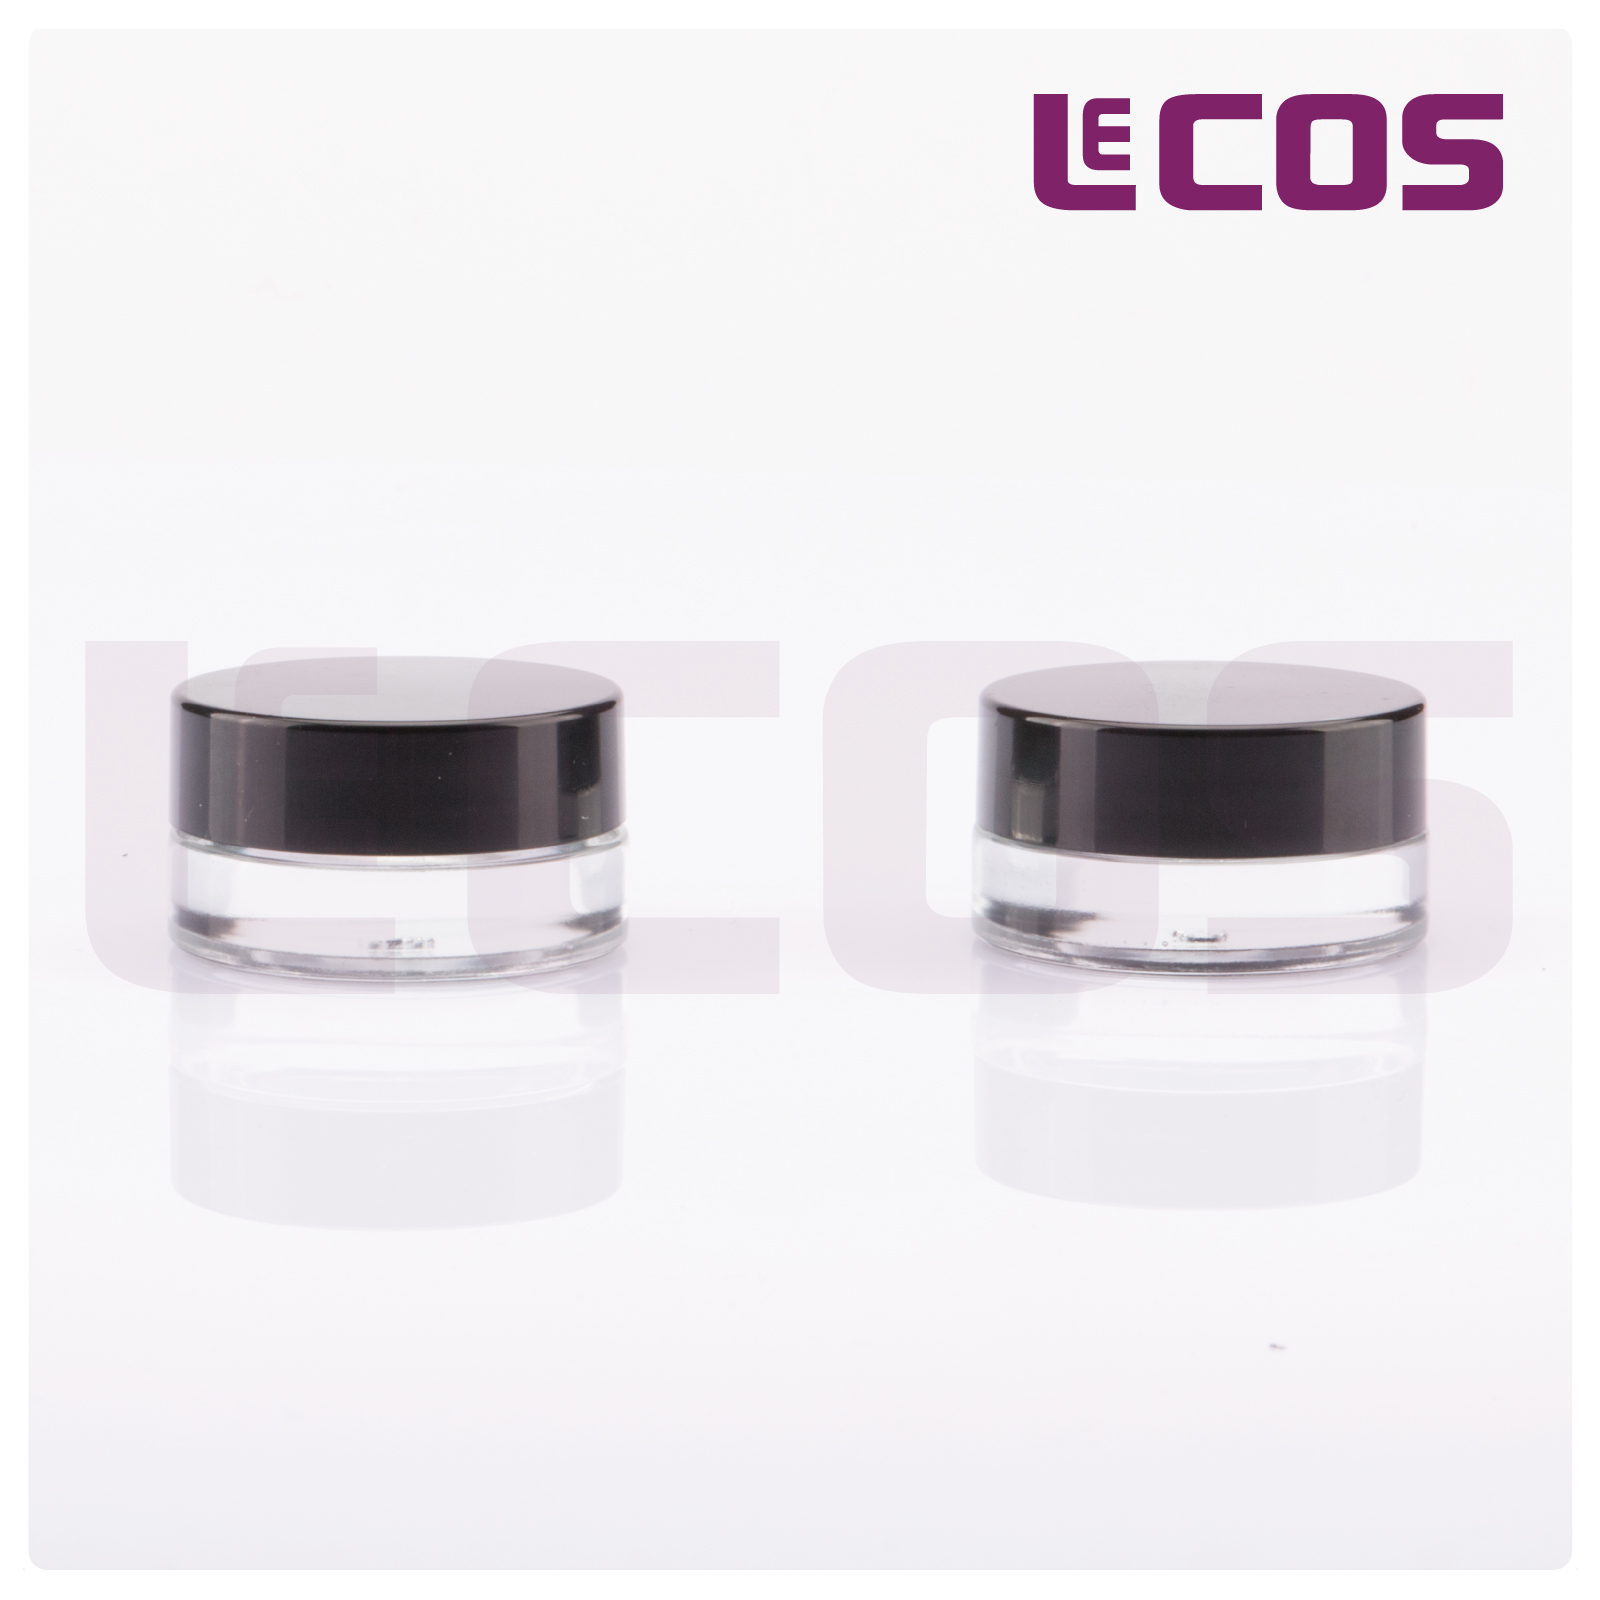 5g Empty Cosmetics Glass Jar with Black Cap